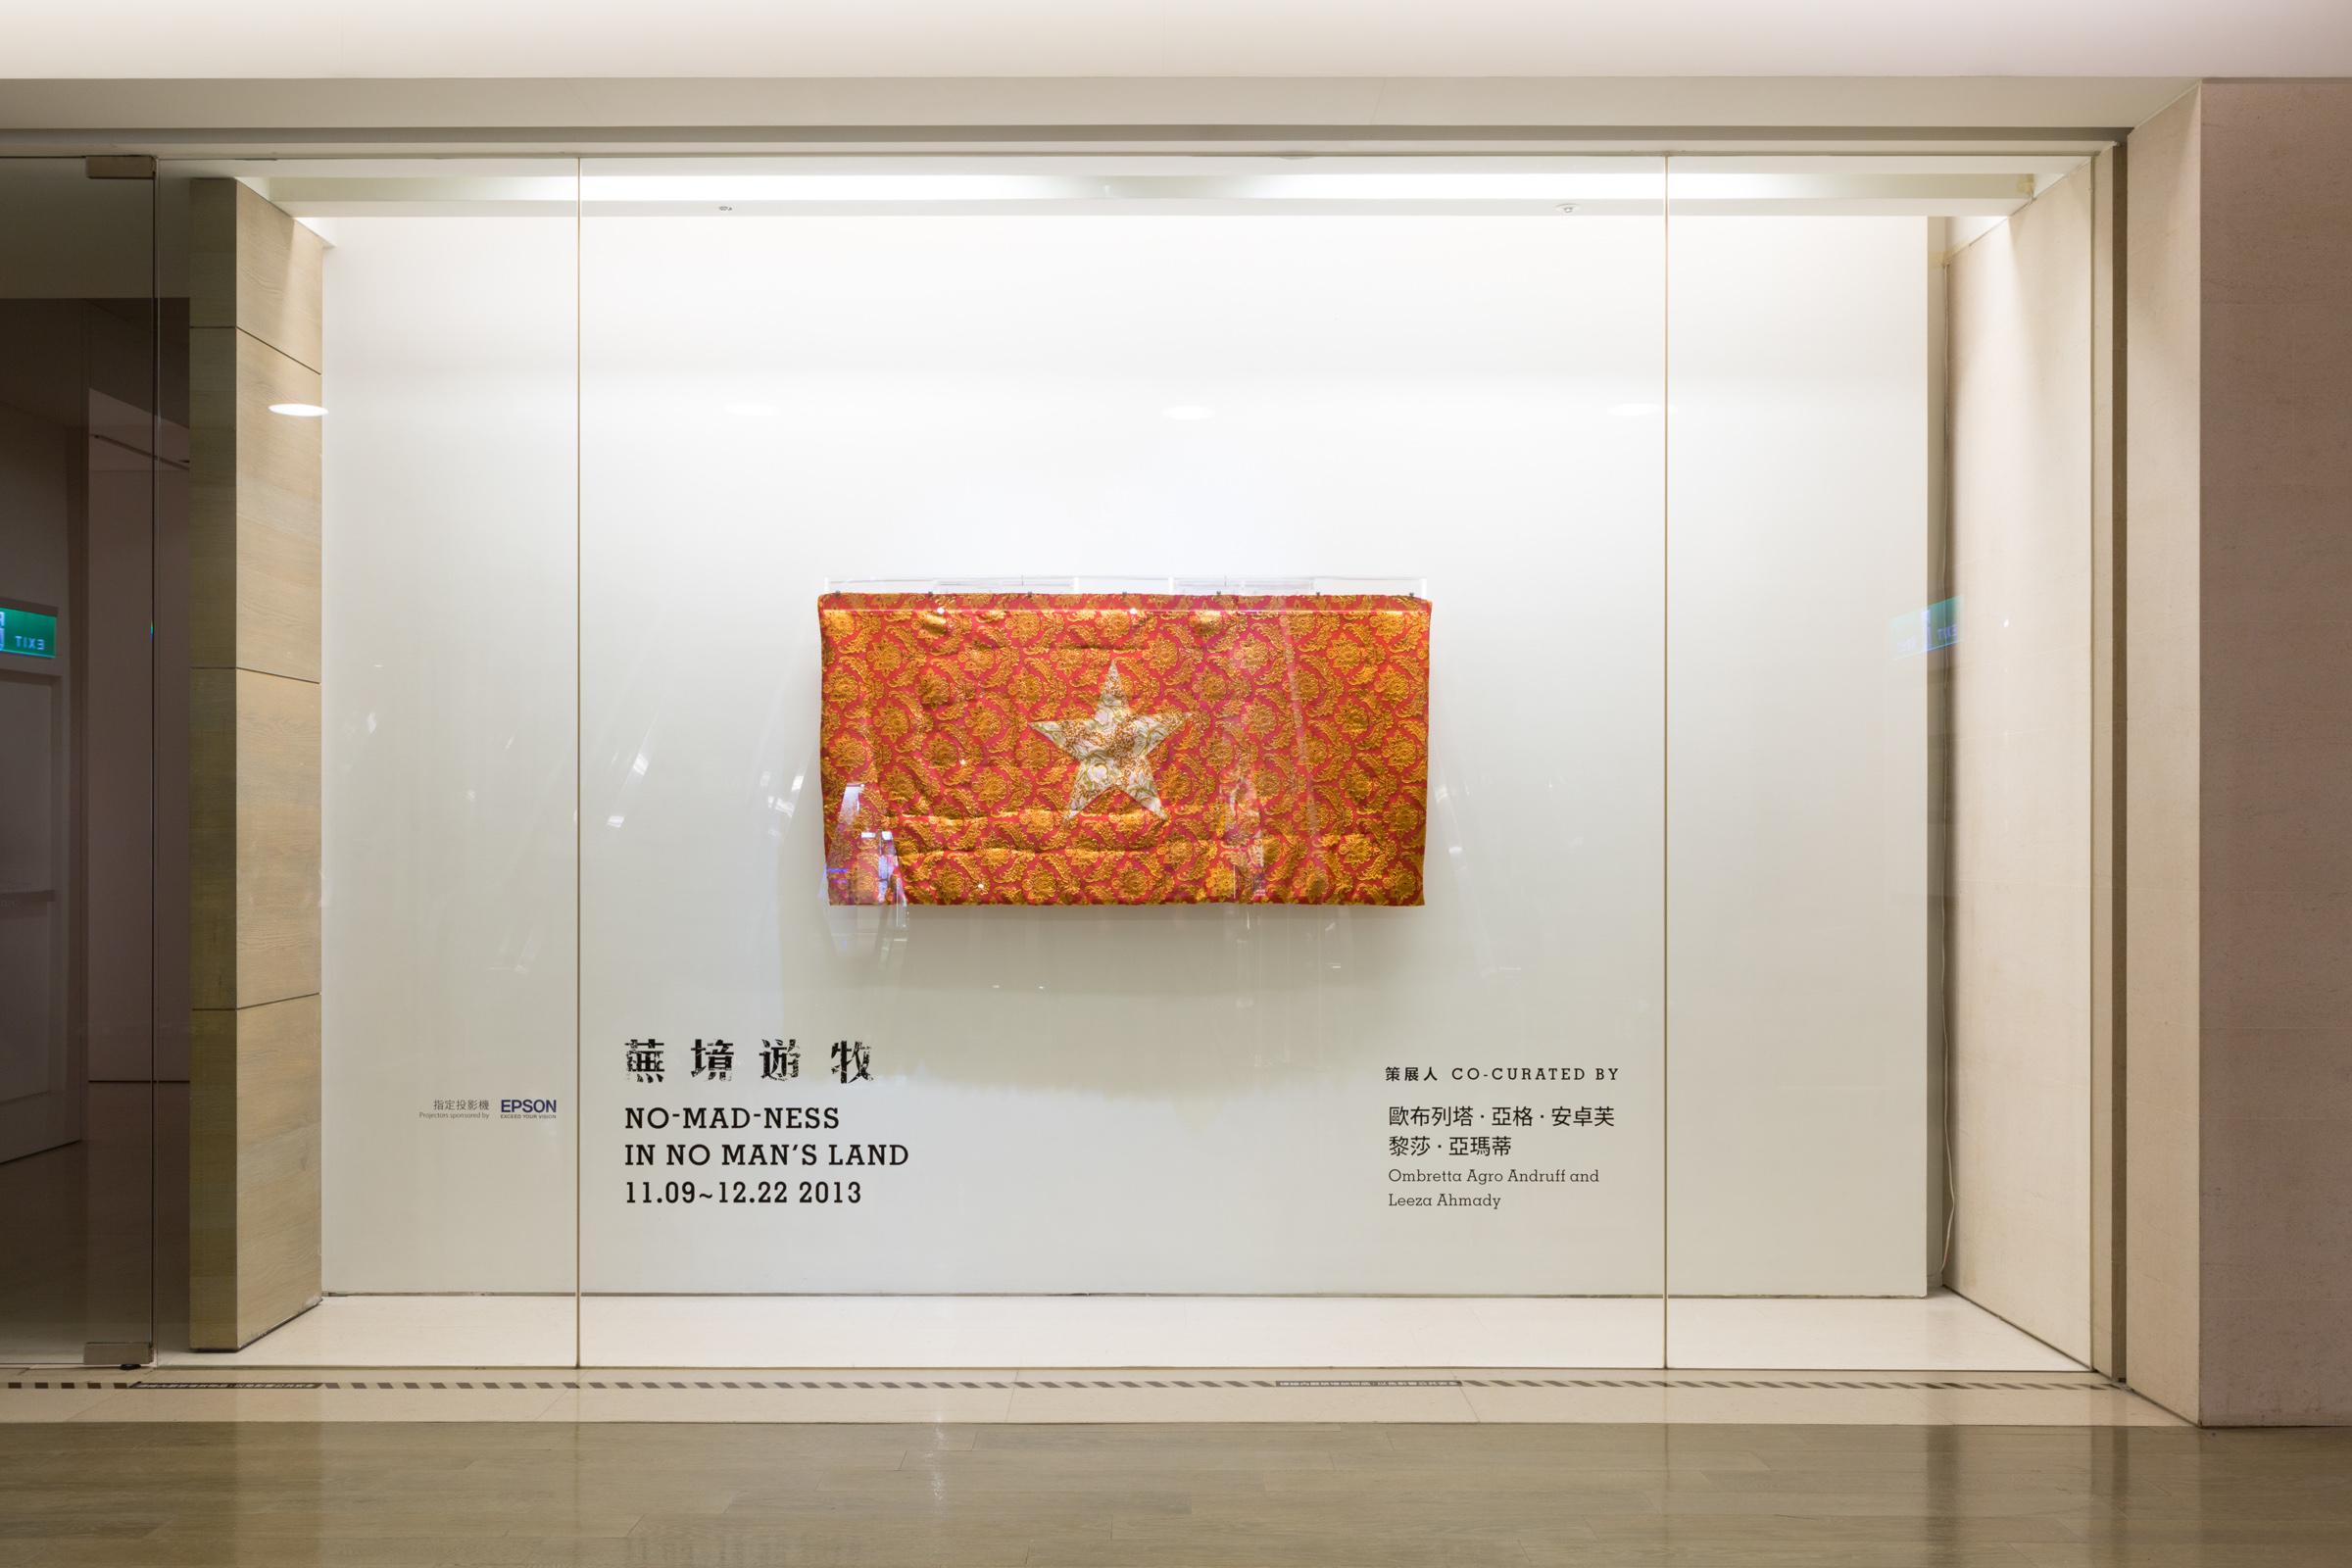 Said Atabekov, Korpeshe Flag #13, 2009-2011, Silk and Cotton